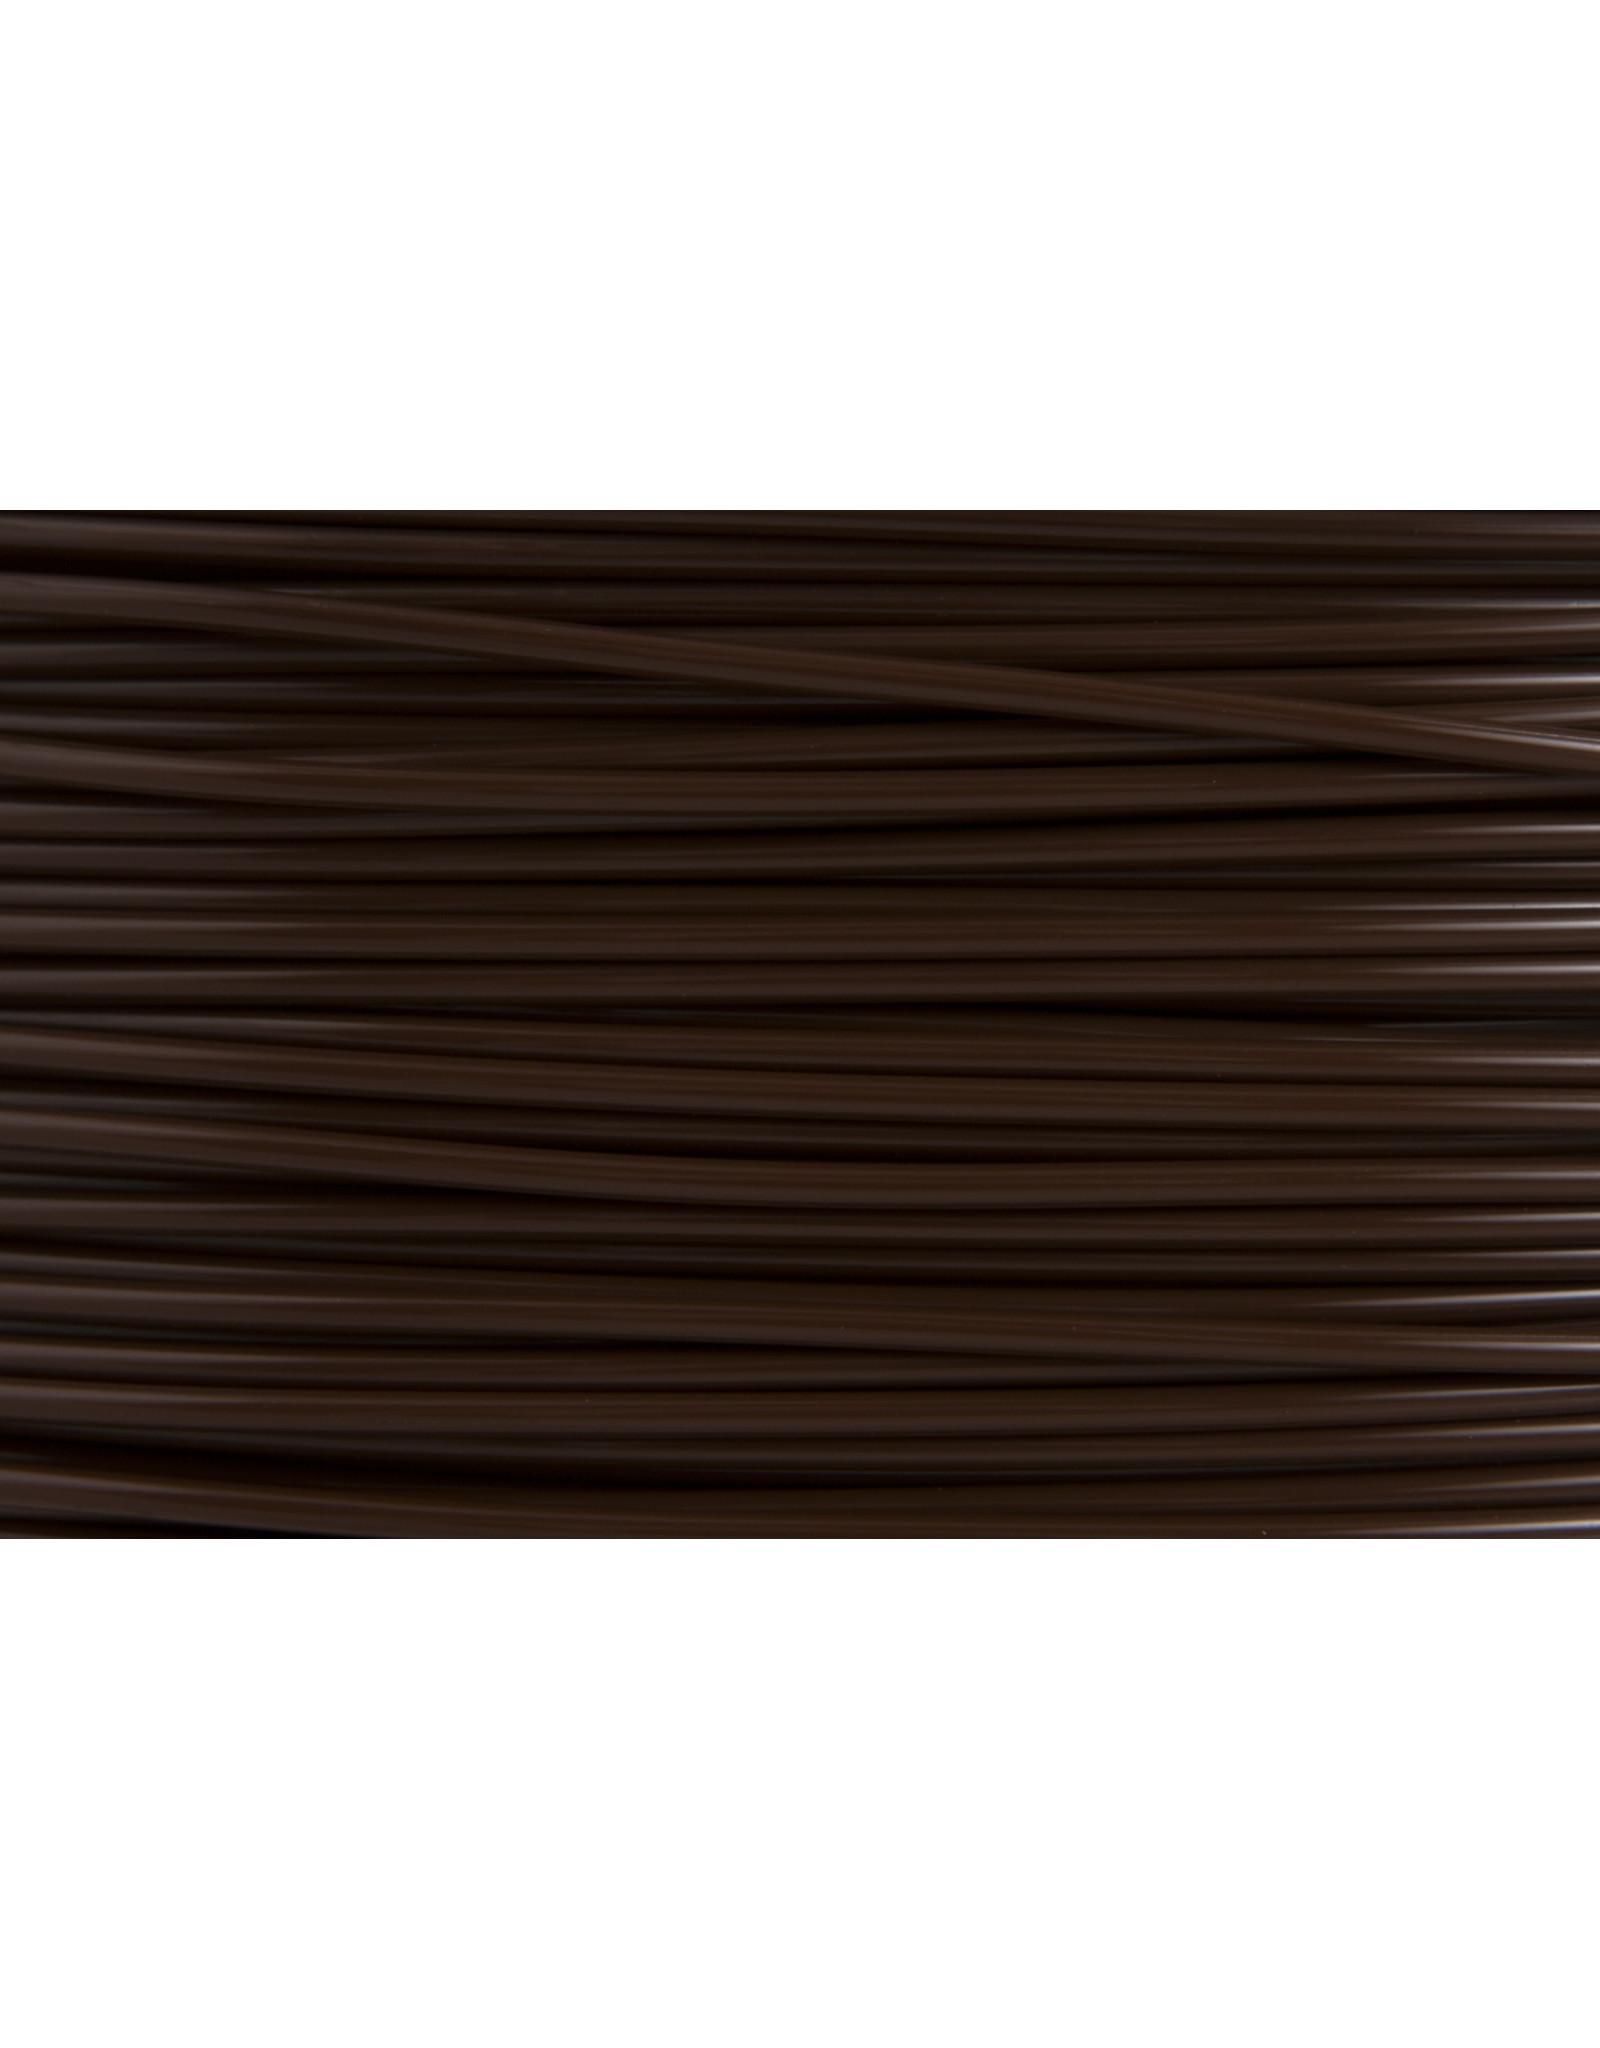 Prima PrimaSelect PLA 1.75mm - 750gr Brown